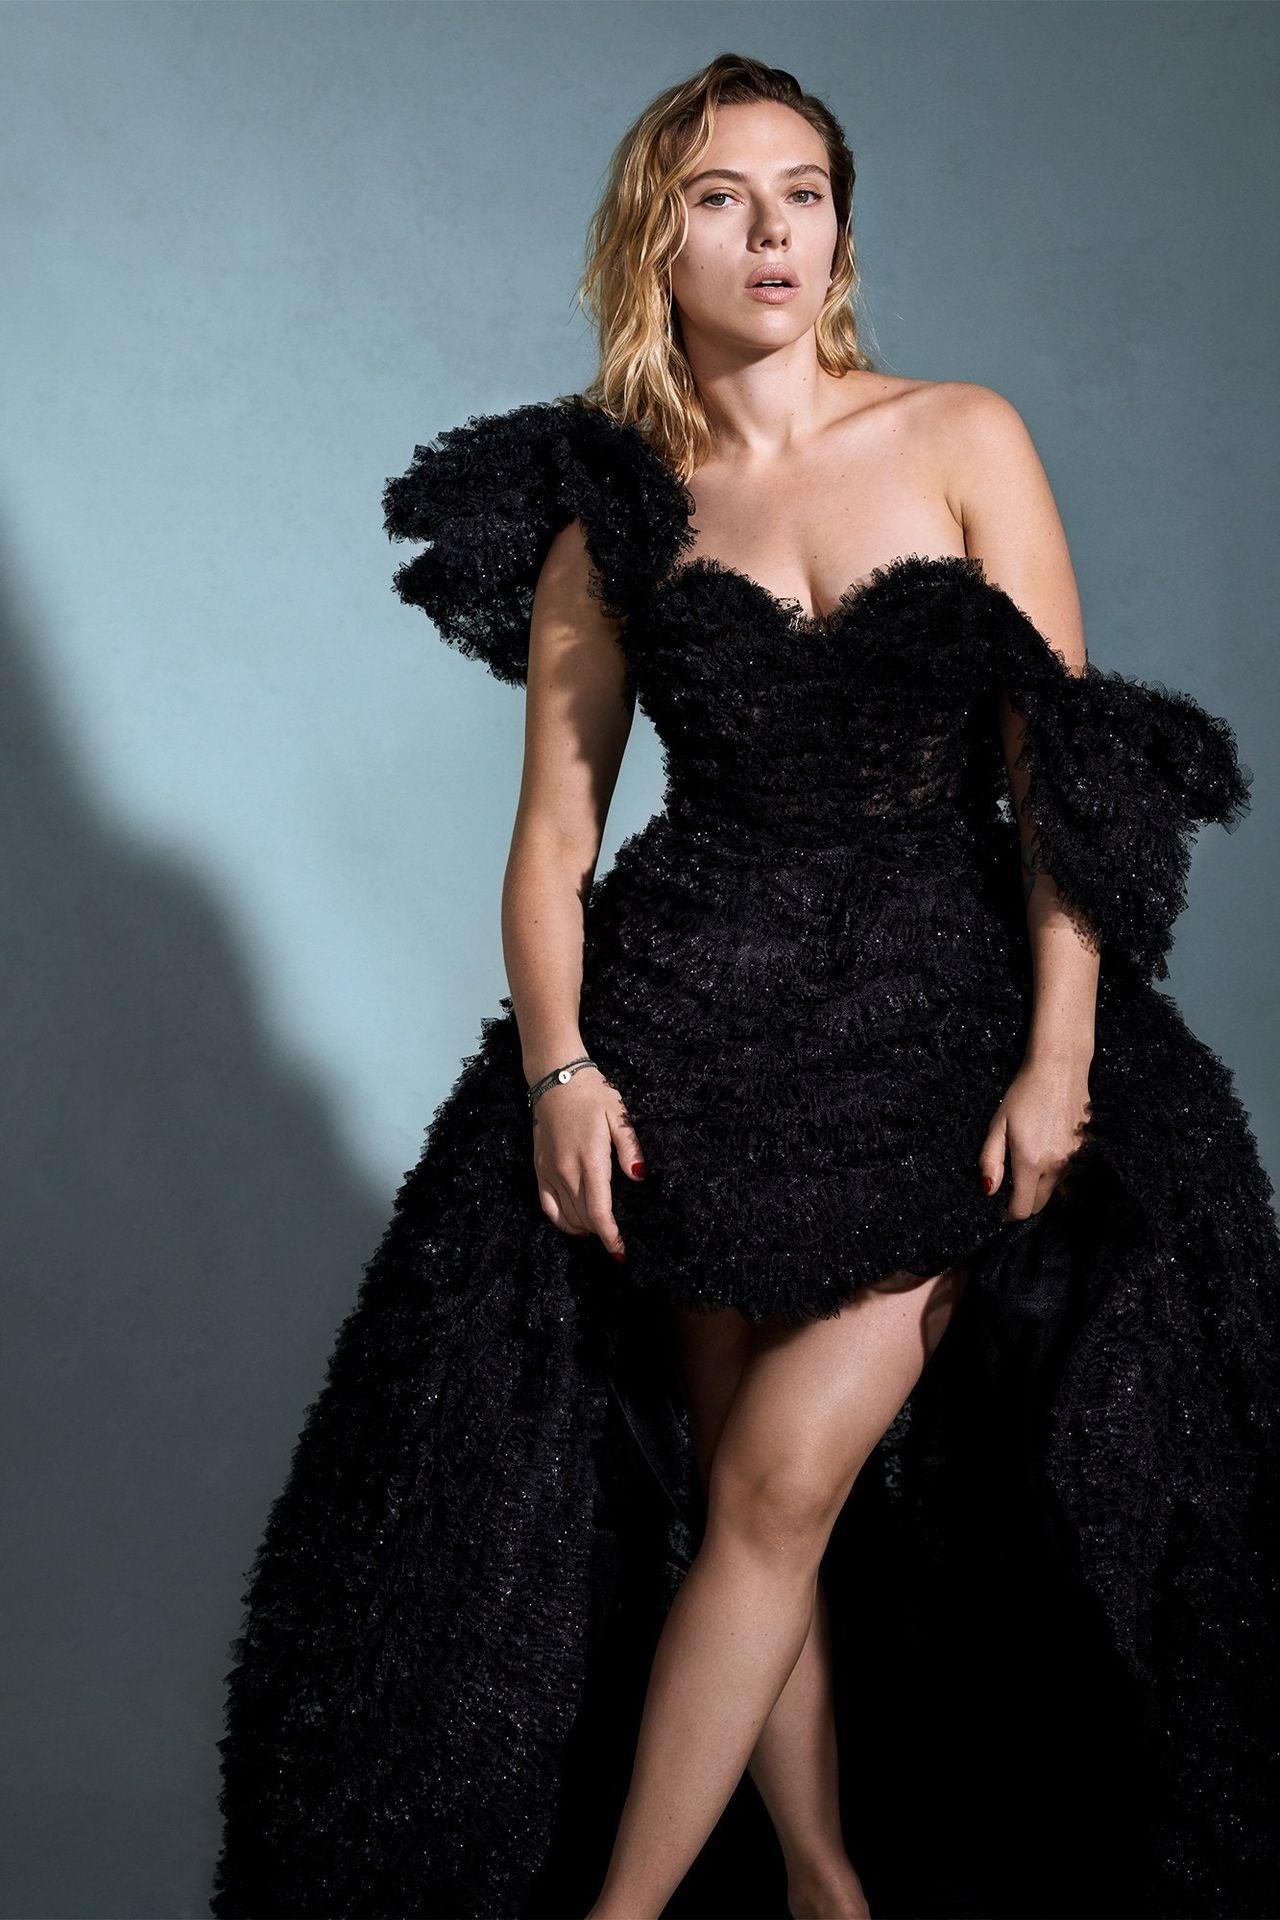 Scarlett Johansson Sexy 0001